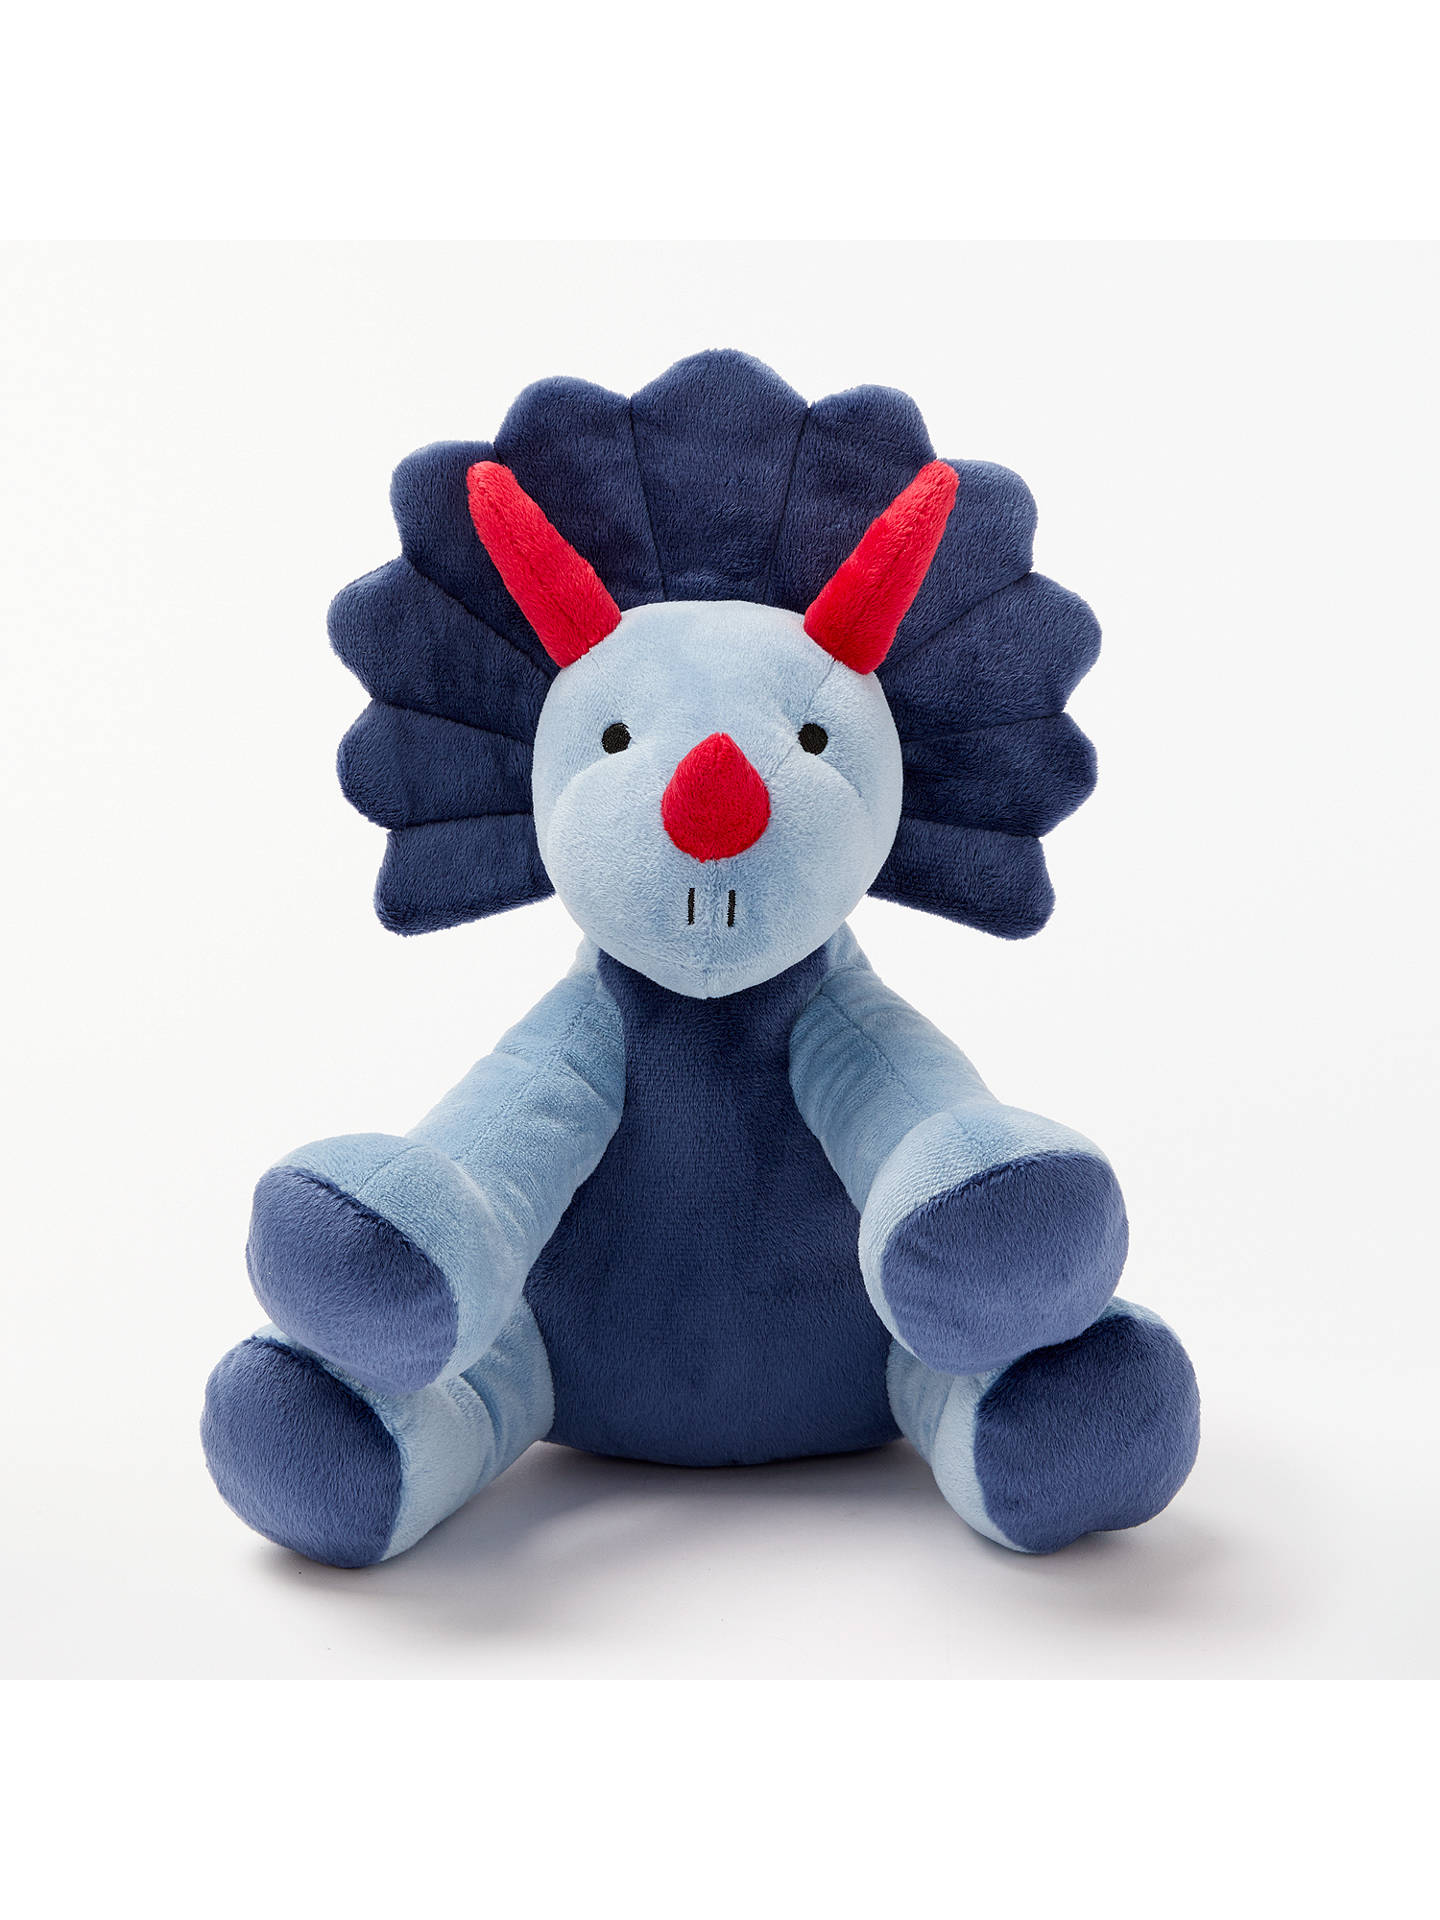 John Lewis  Partners Triceratops Dinosaur Plush Soft Toy, Blue At John Lewis  Partners